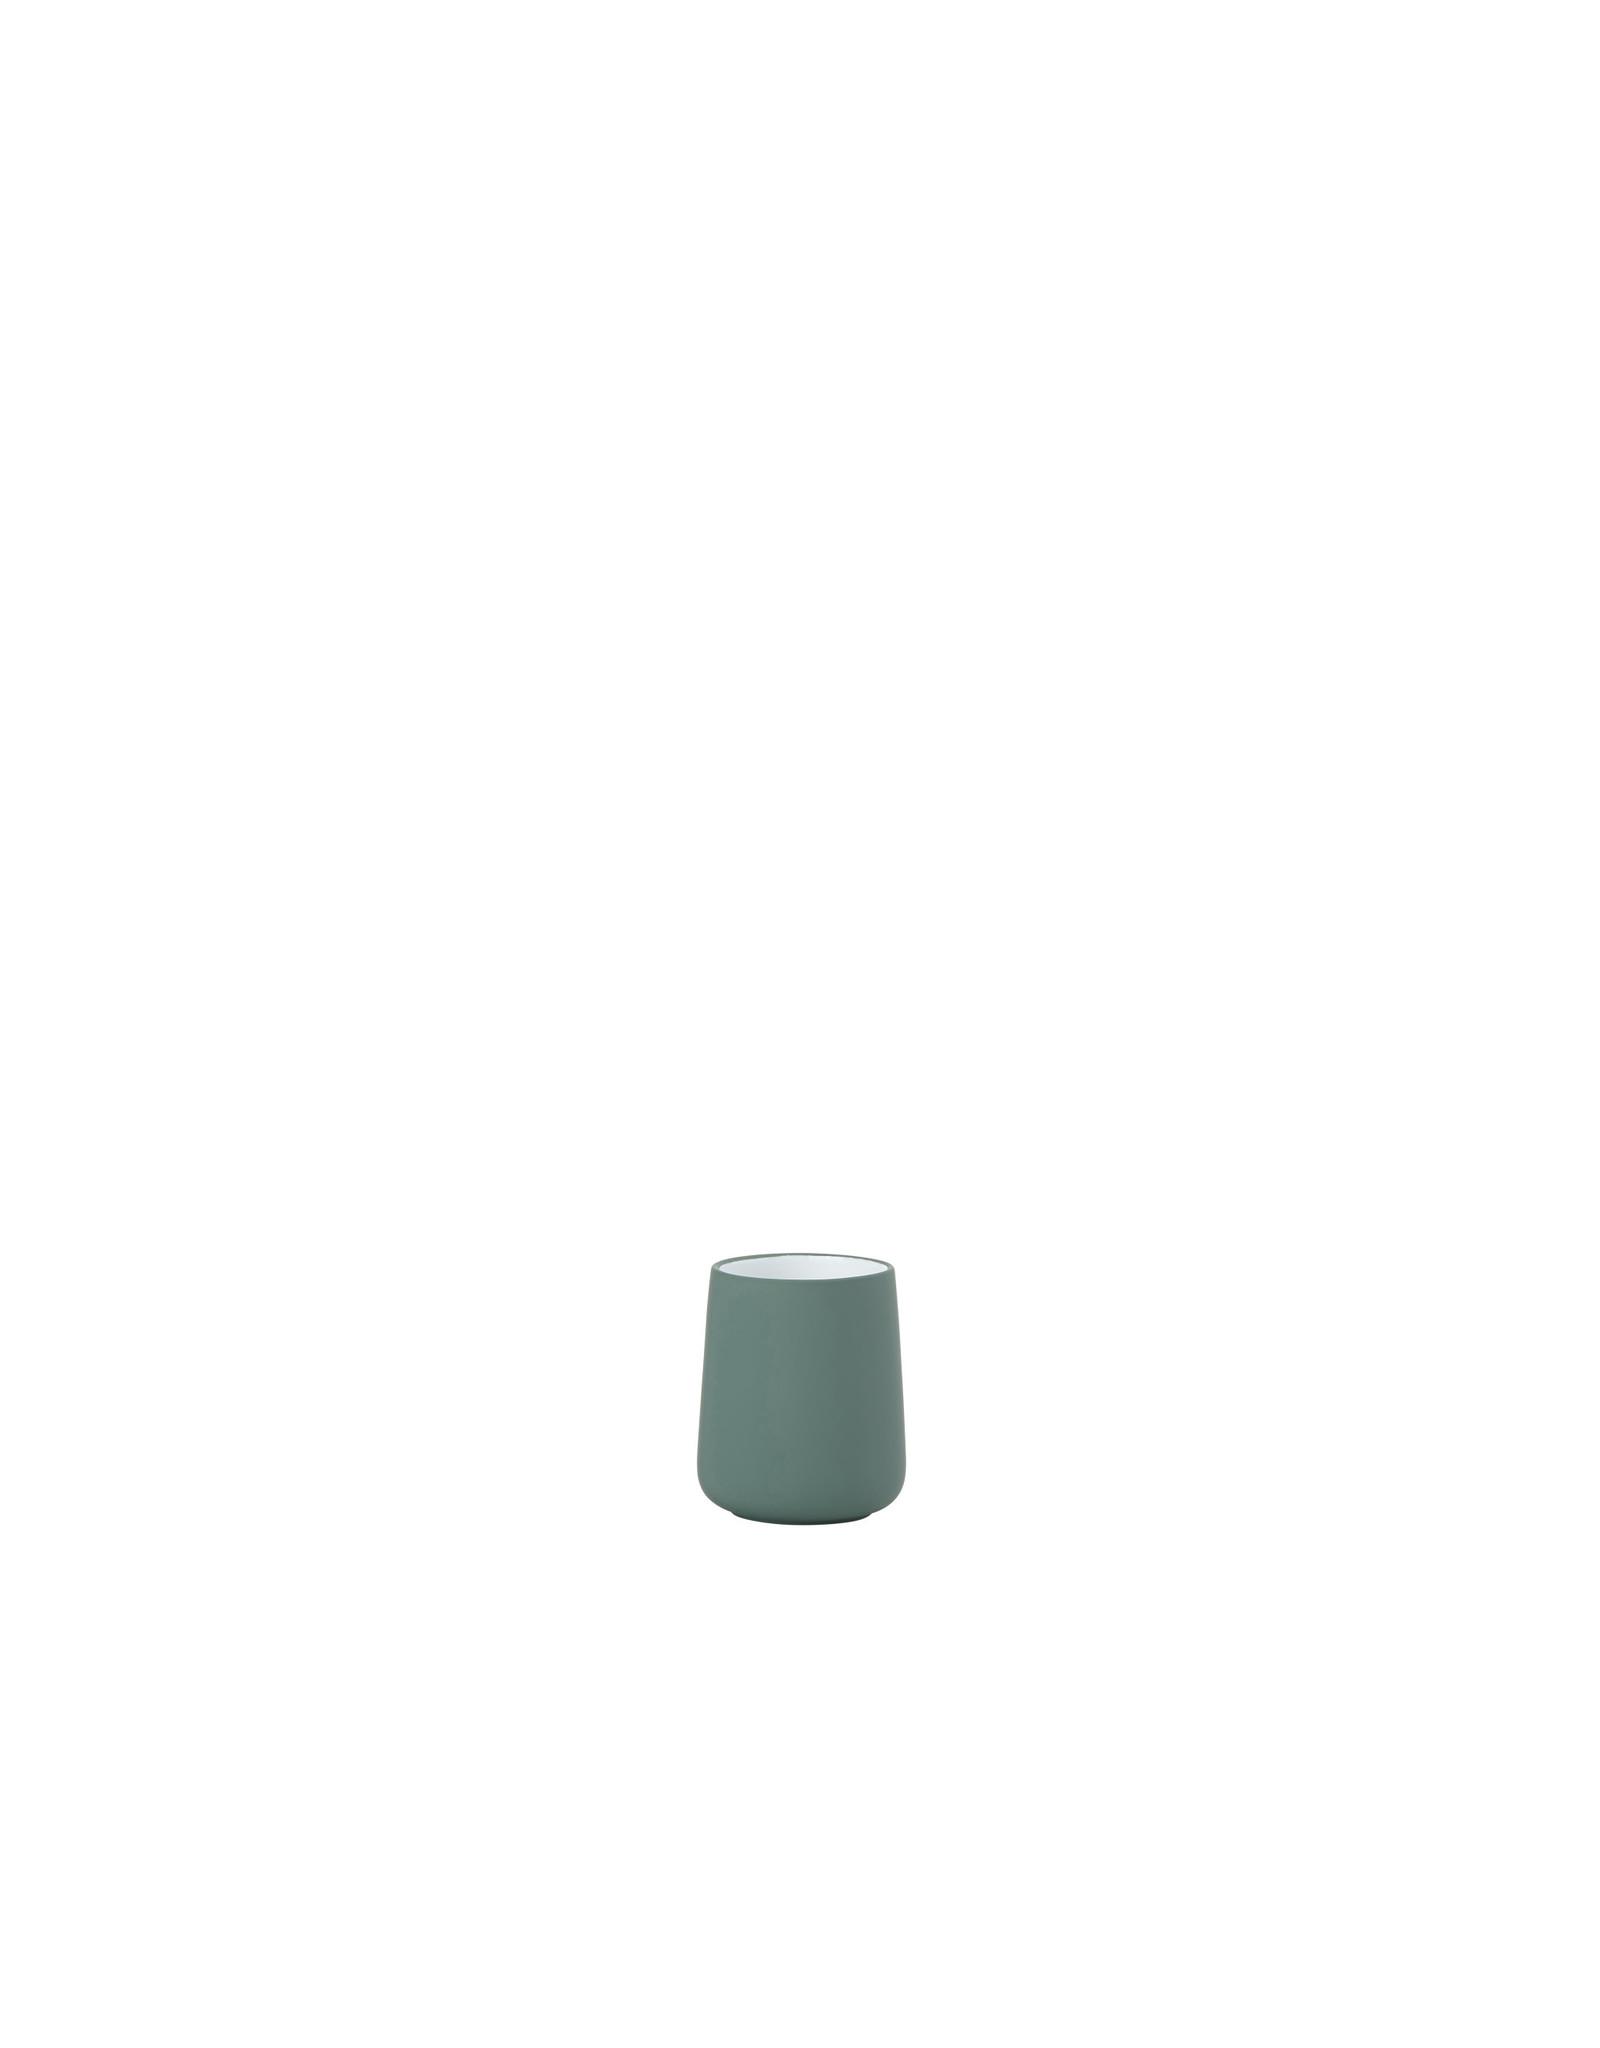 ZONE ZONE 330157 TANDENBORSTELHOUDER PETROL GREEN